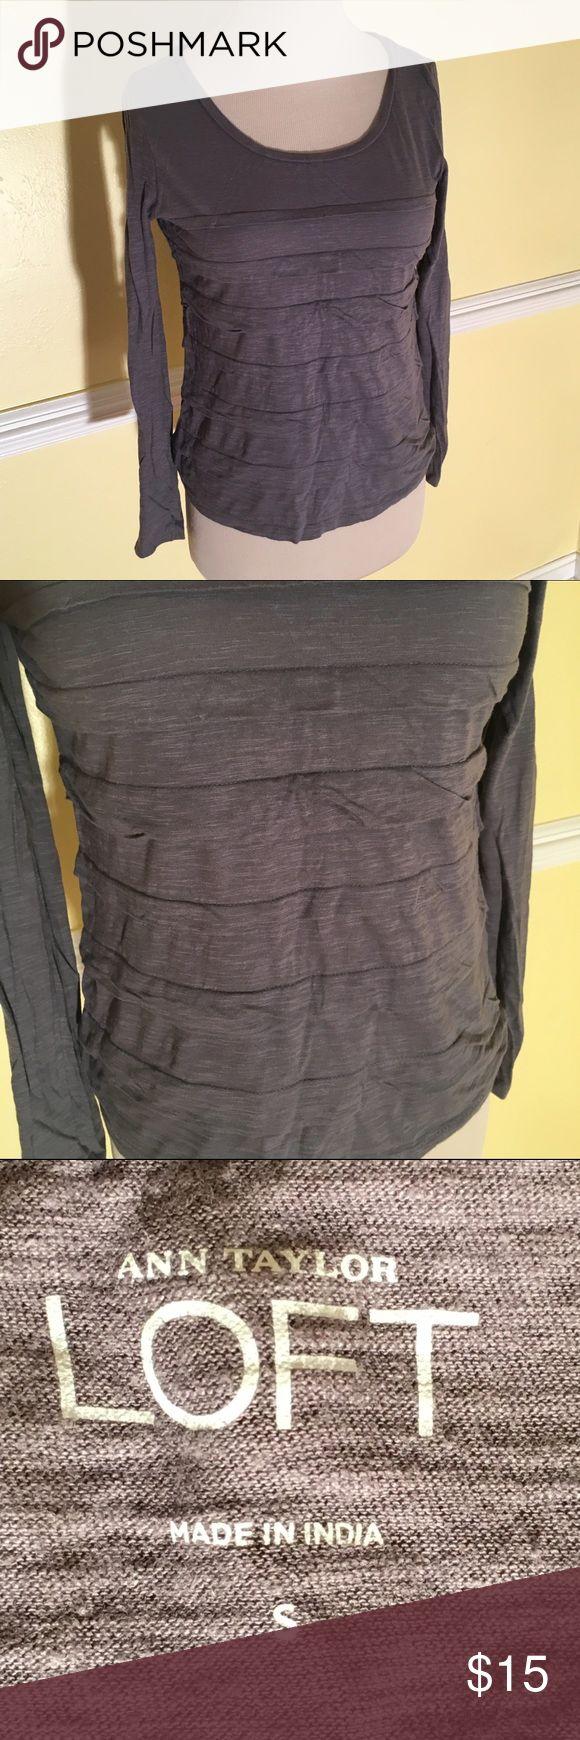 Ann Taylor Loft Ann Taylor Loft Gray long sleeve shirt. ANN TAYLOR LOFT Tops